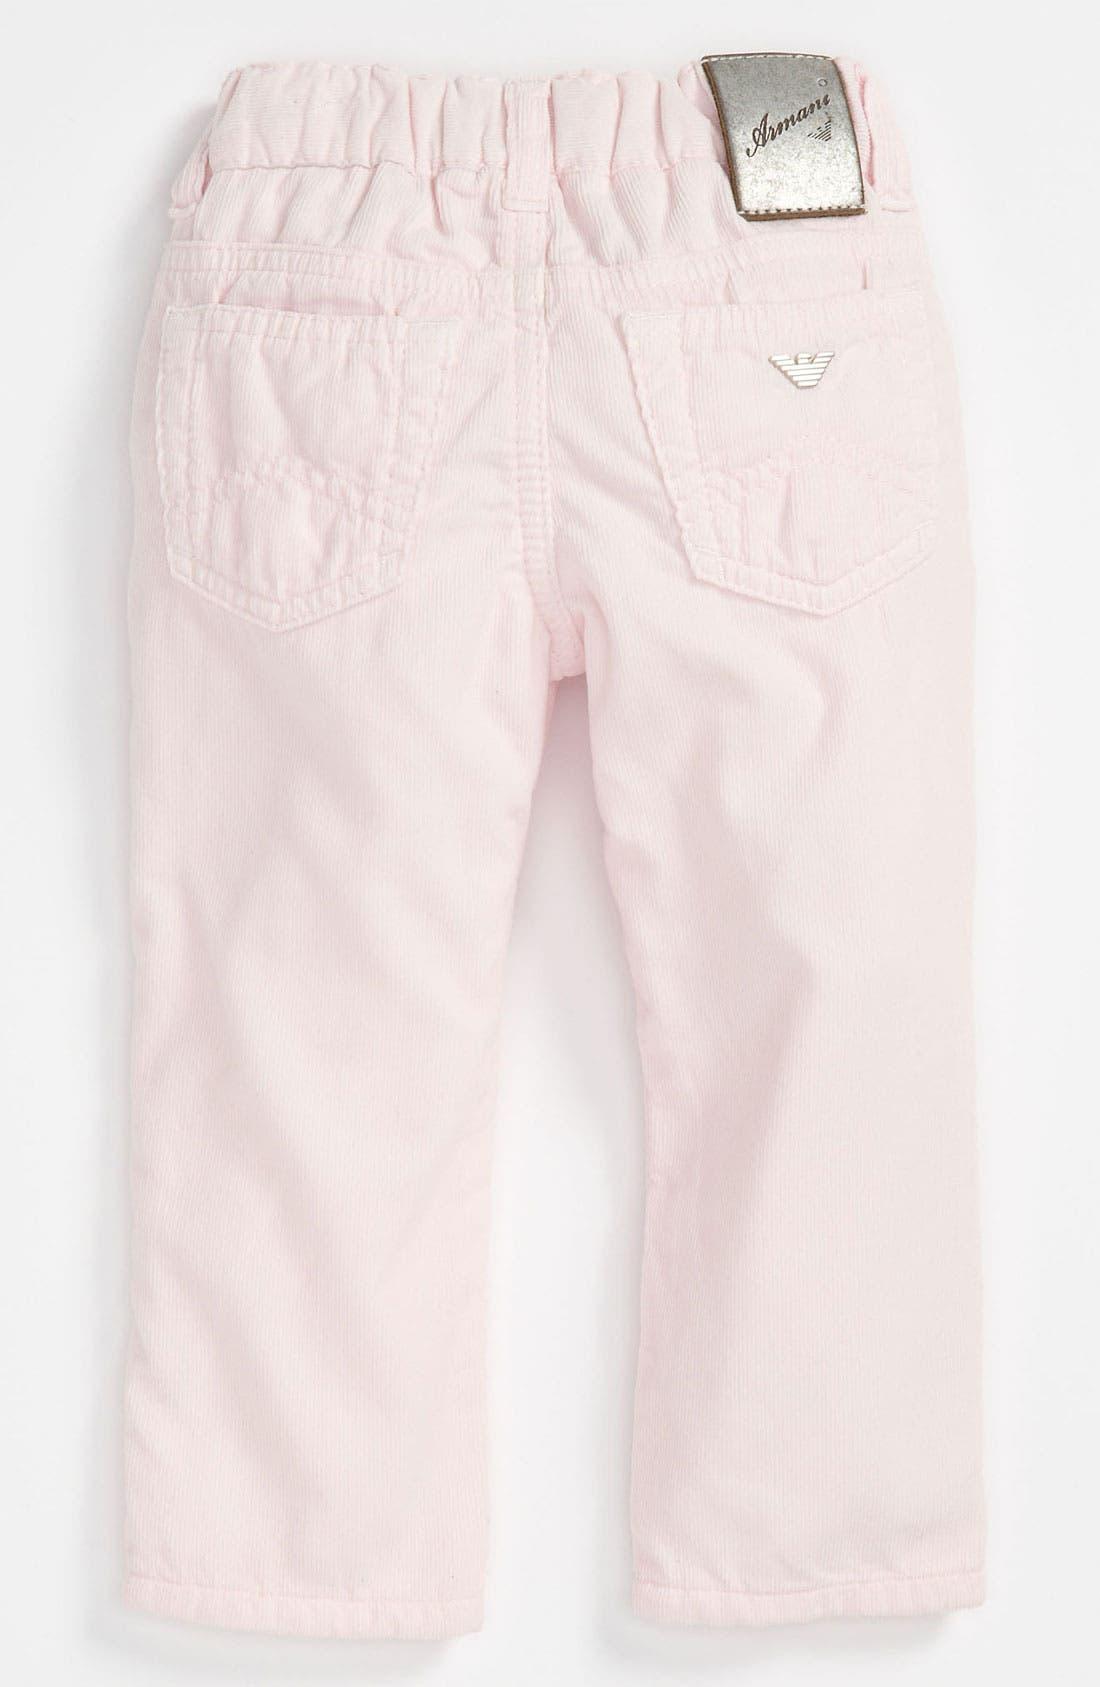 Main Image - Armani Junior Corduroy Pants (Infant)